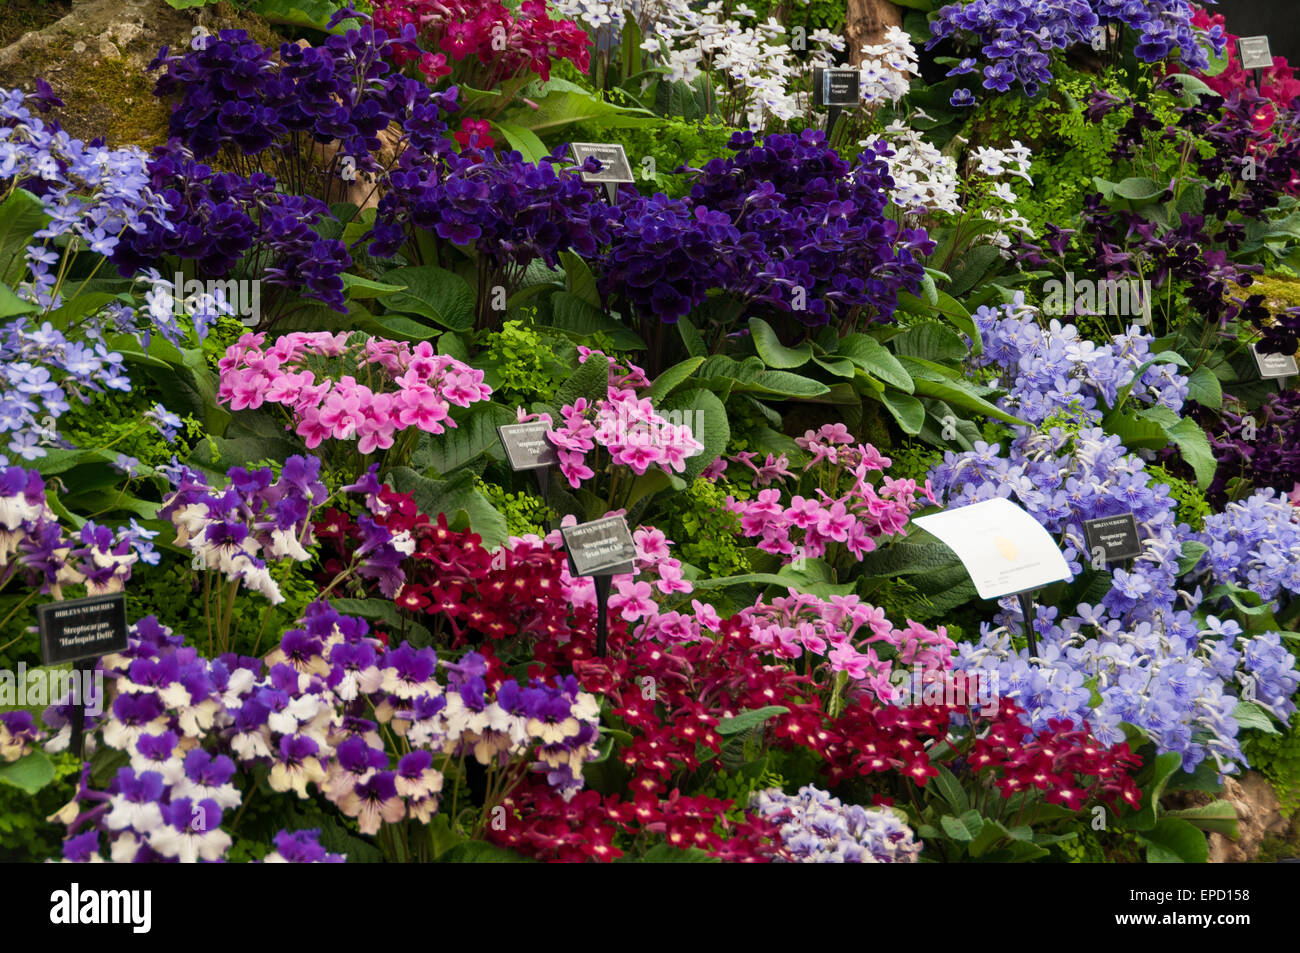 Royal Horticultural Society (RHS) Malvern Spring Festival, 9th May 2015 Stock Photo